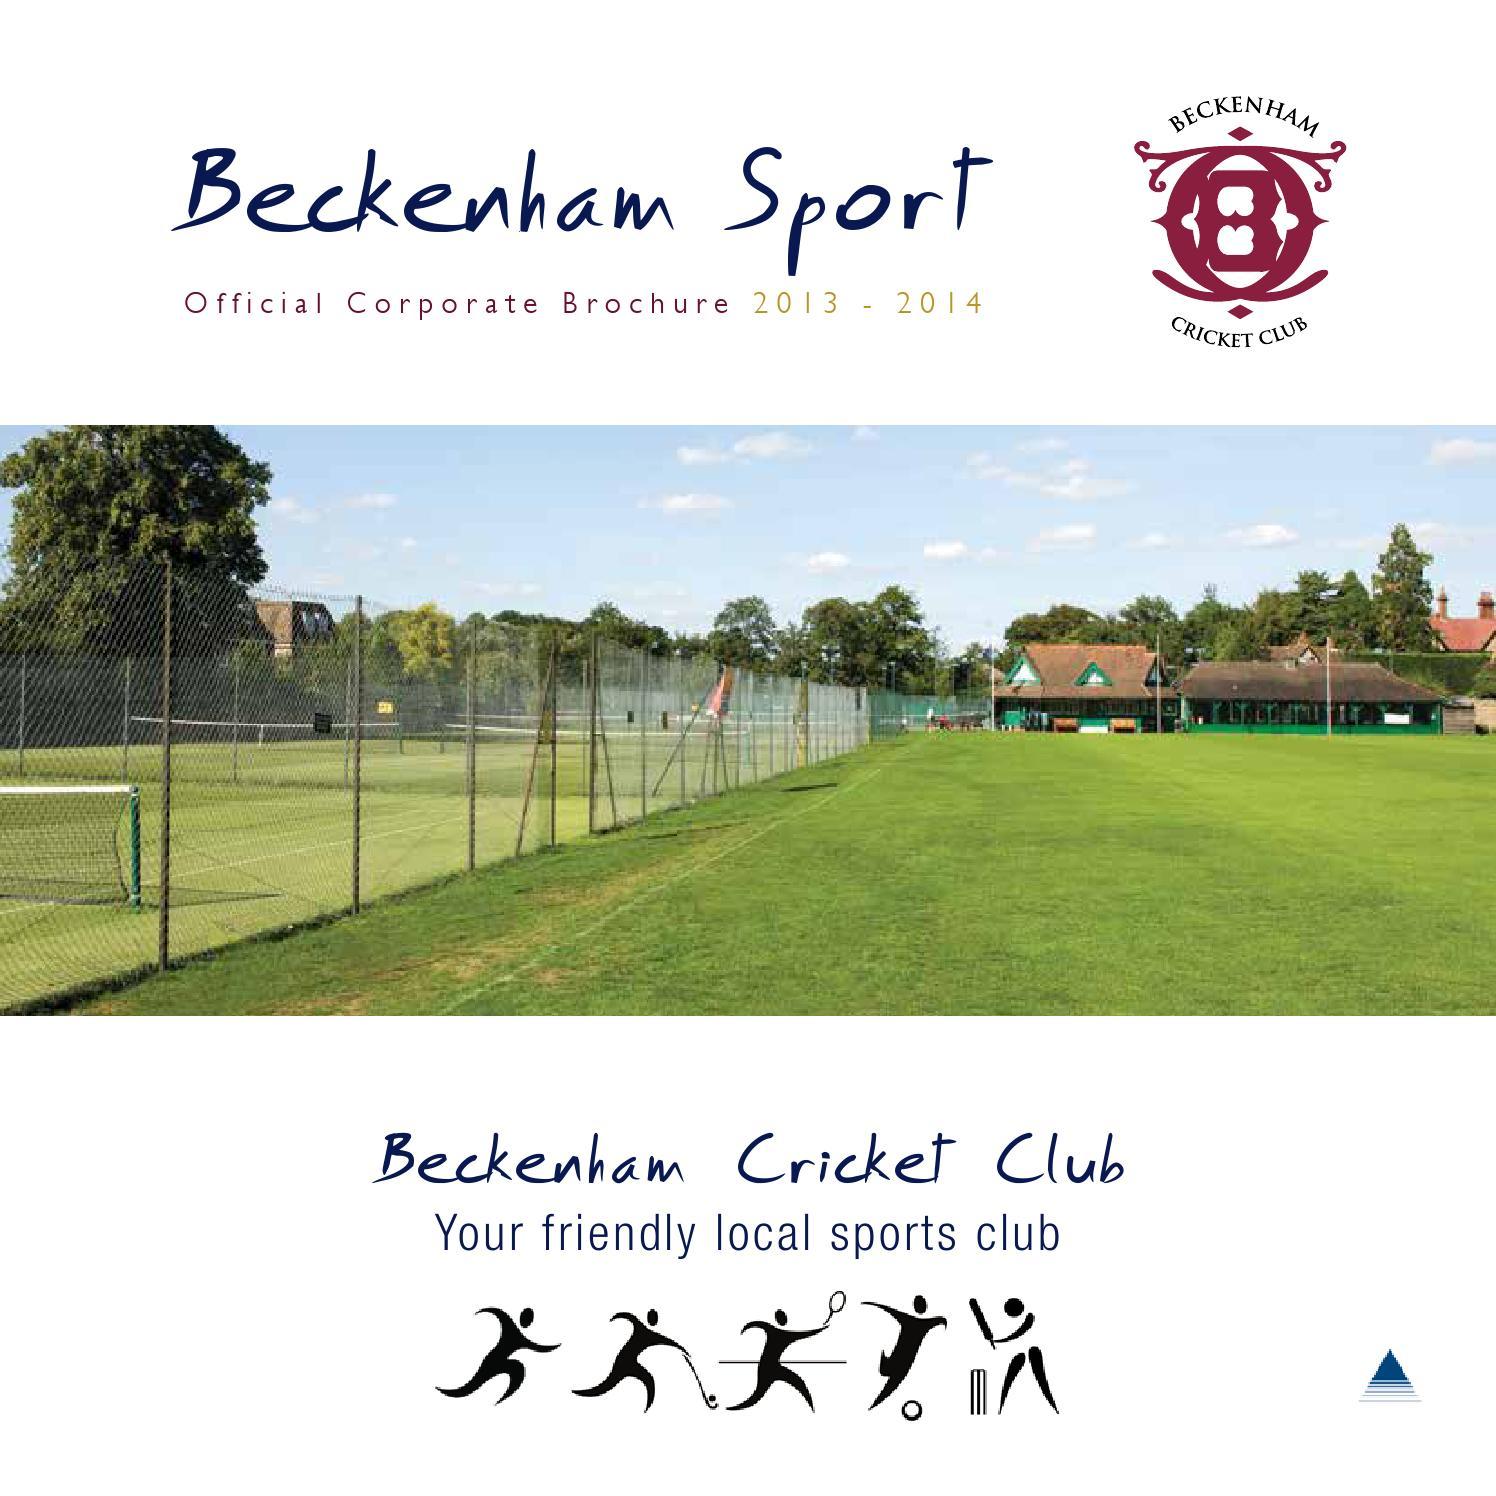 Beckenham Sport Club Brochure 2013 By Global Sports Media